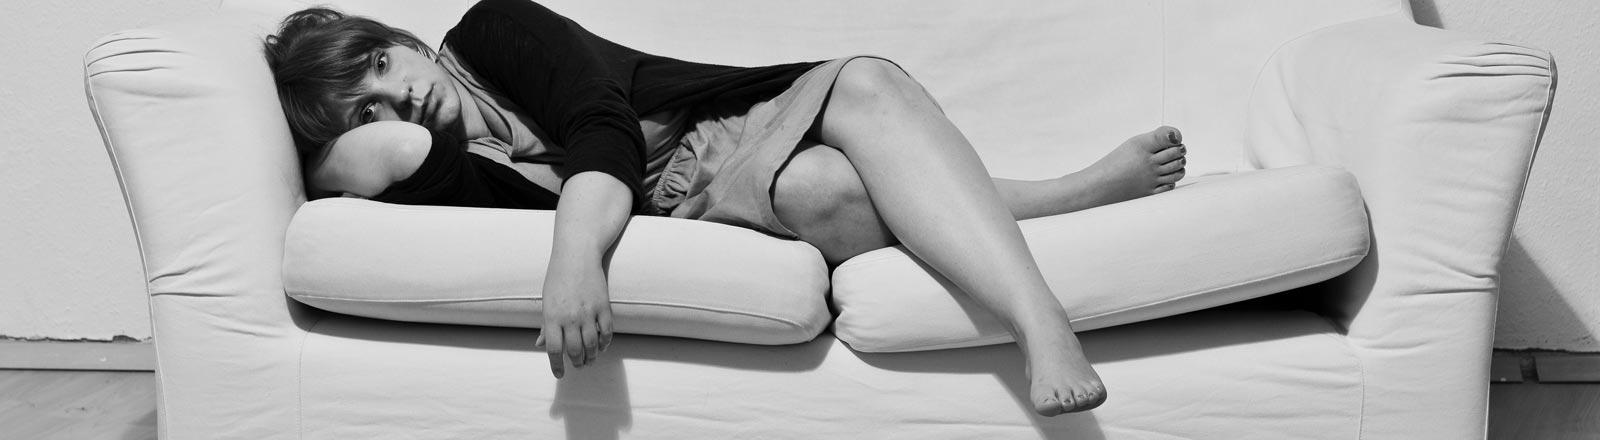 Eien Frau liegt auf einem Sofa.